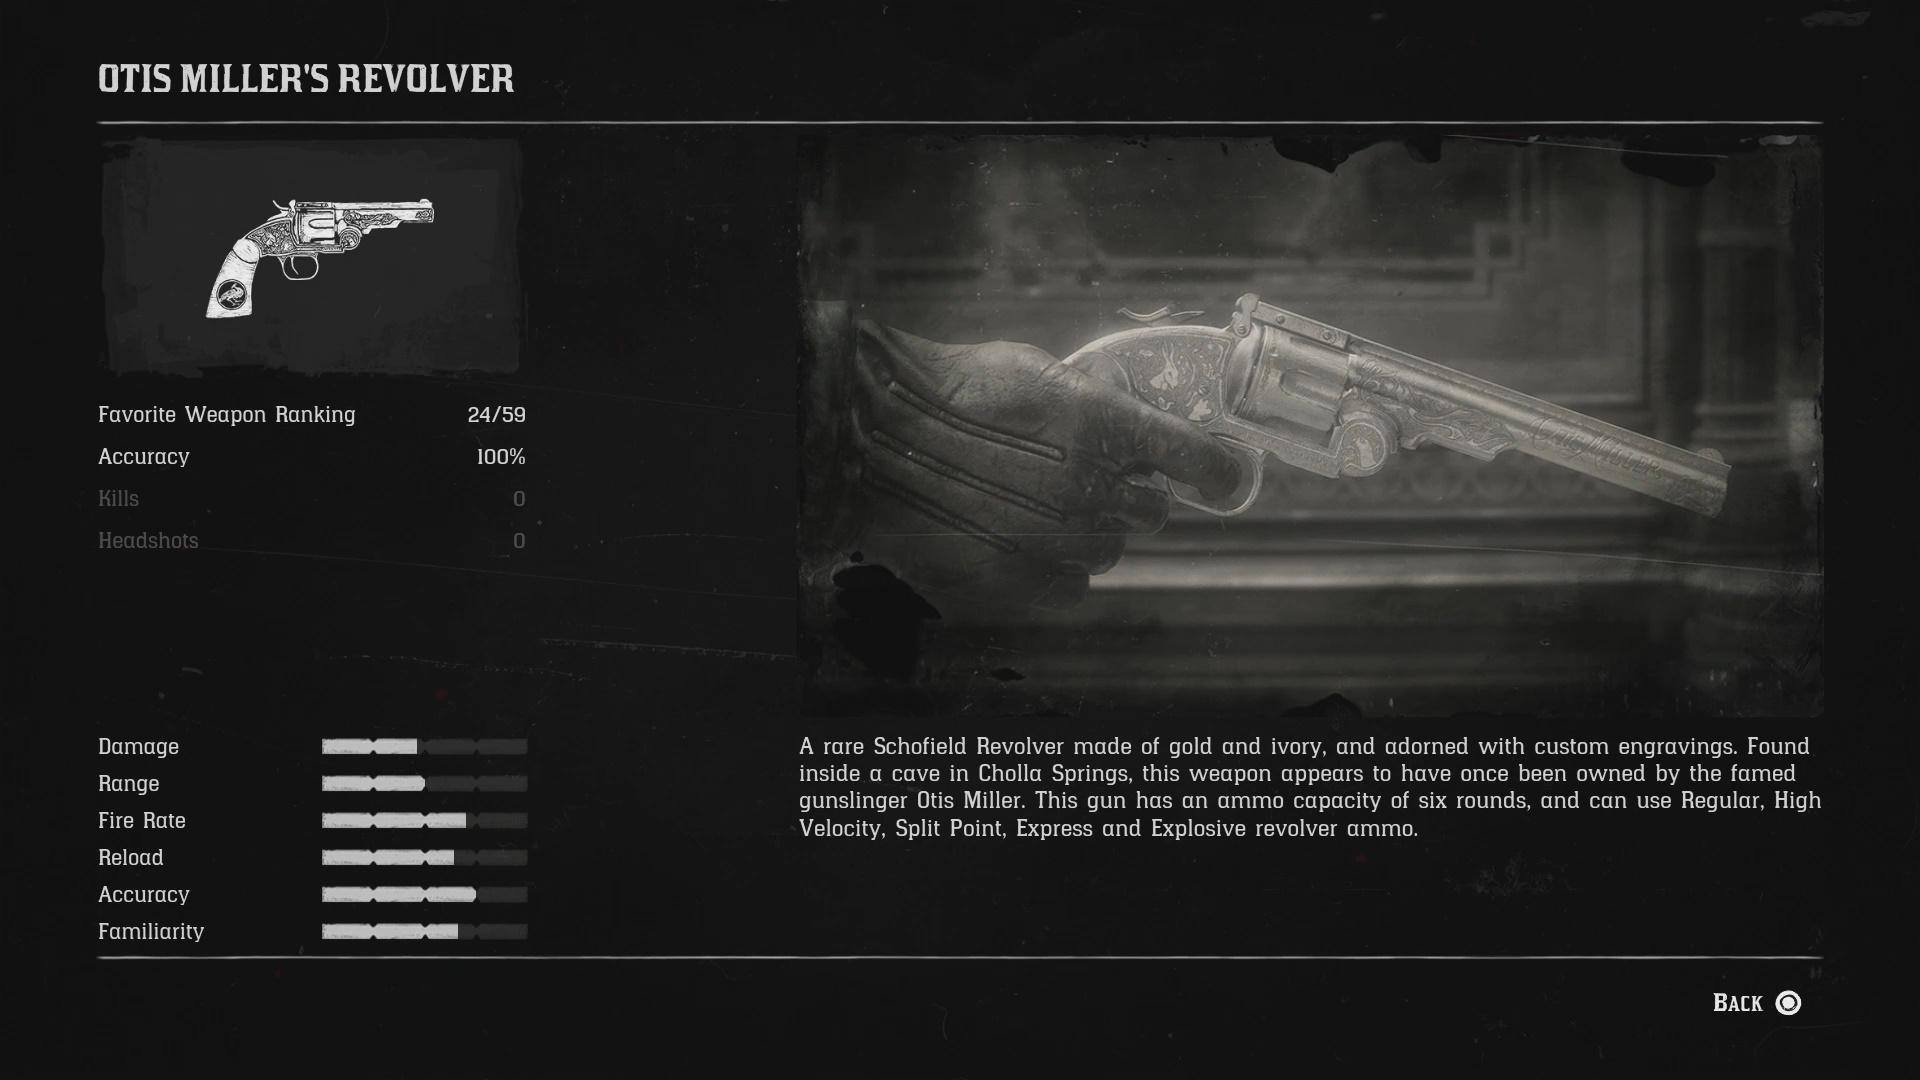 How to Get Otis Miller's Revolver in Red Dead Redemption 2